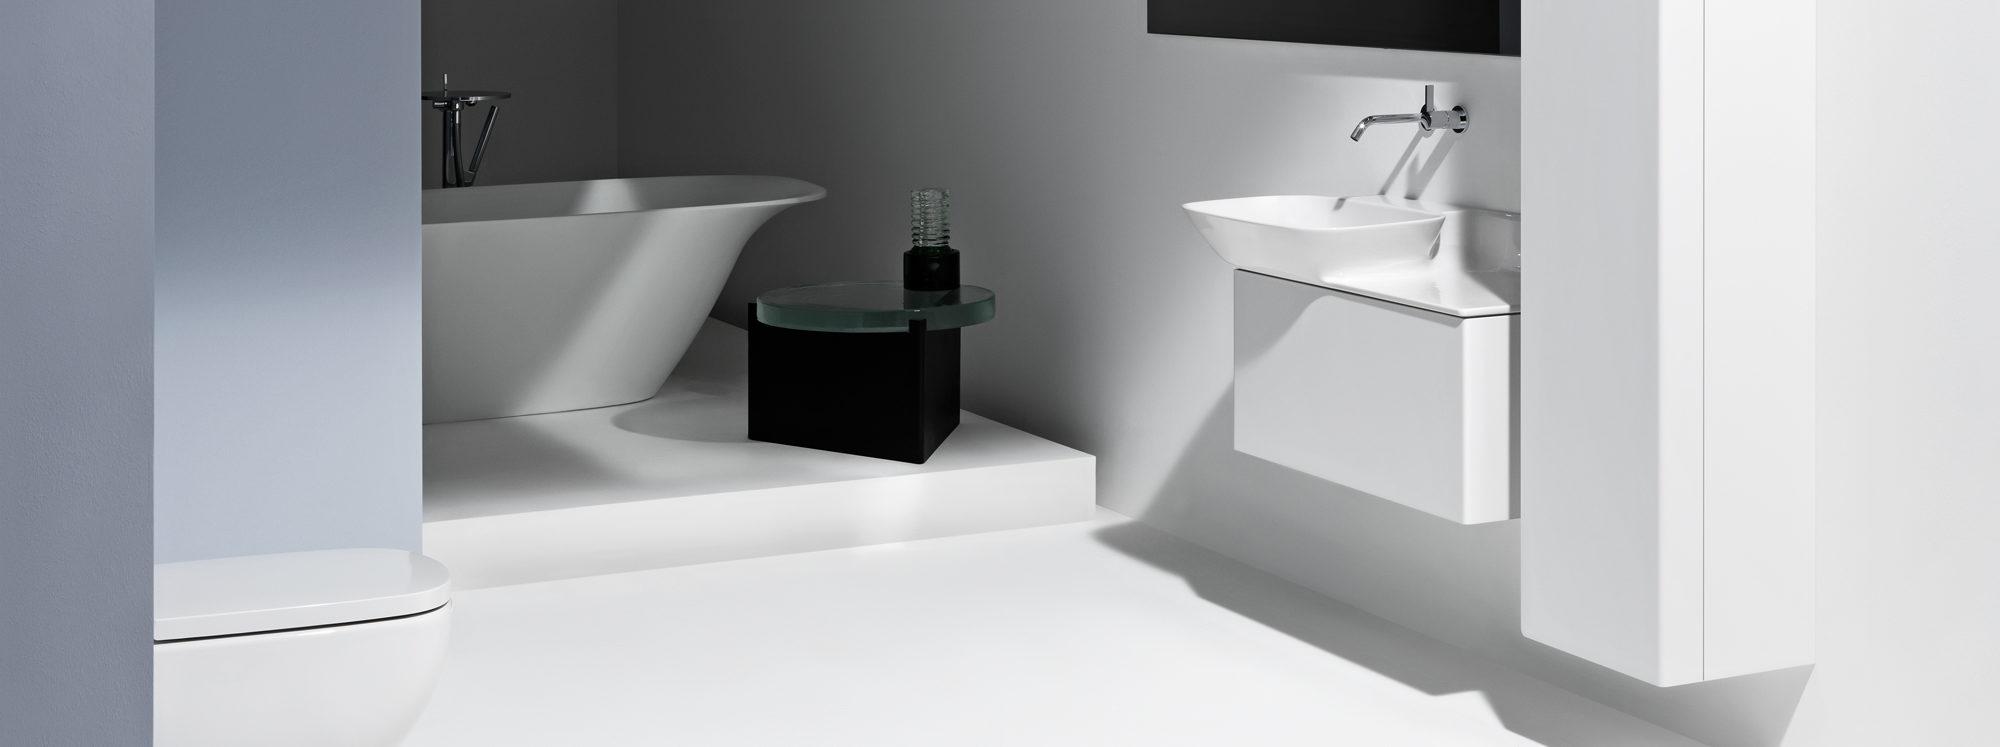 Laufen sanitarios lavabos e inodoros